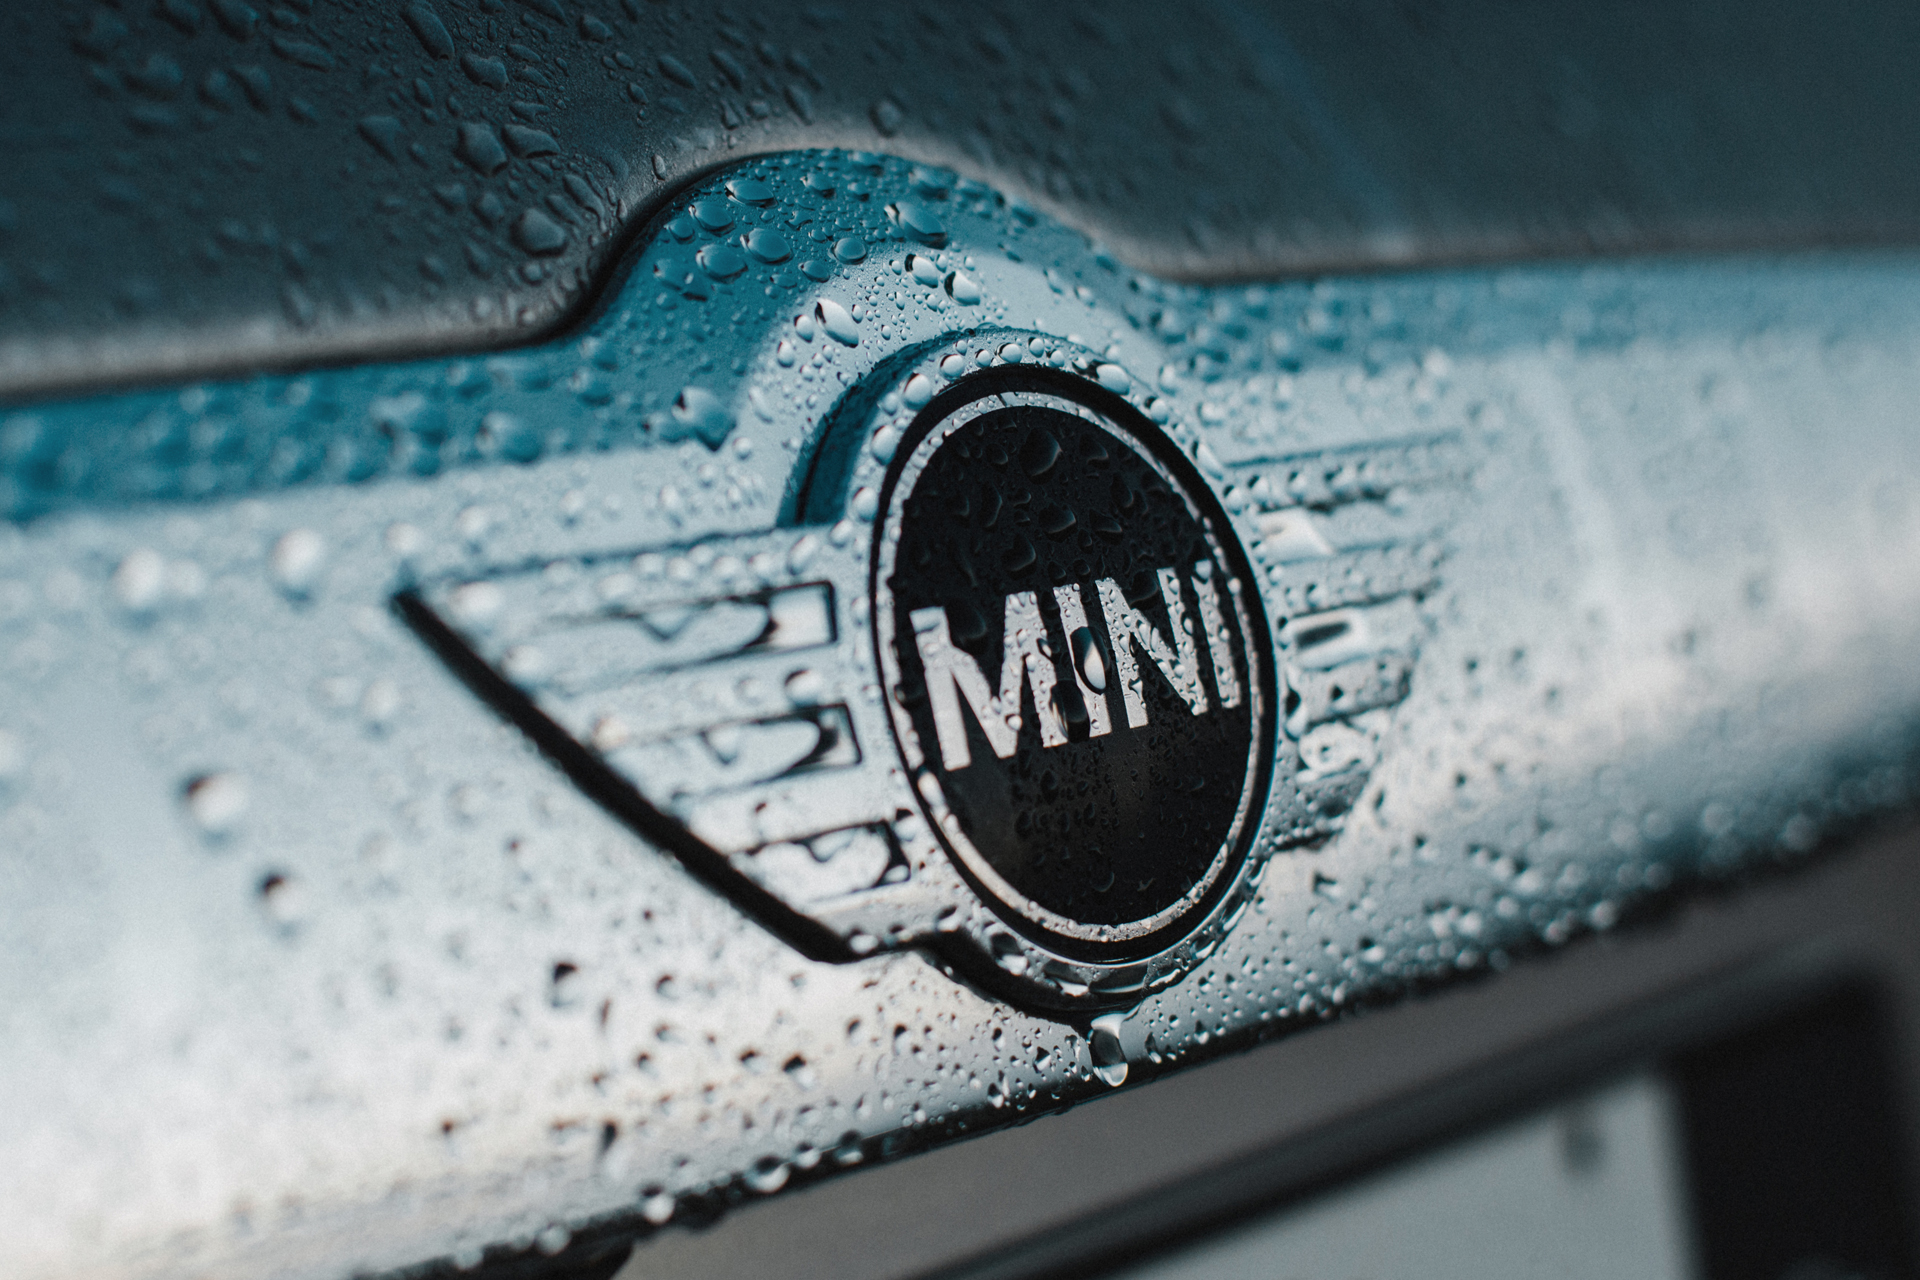 Mini-Countryman_Automotive_Photography_Video_New-Zealand.jpg